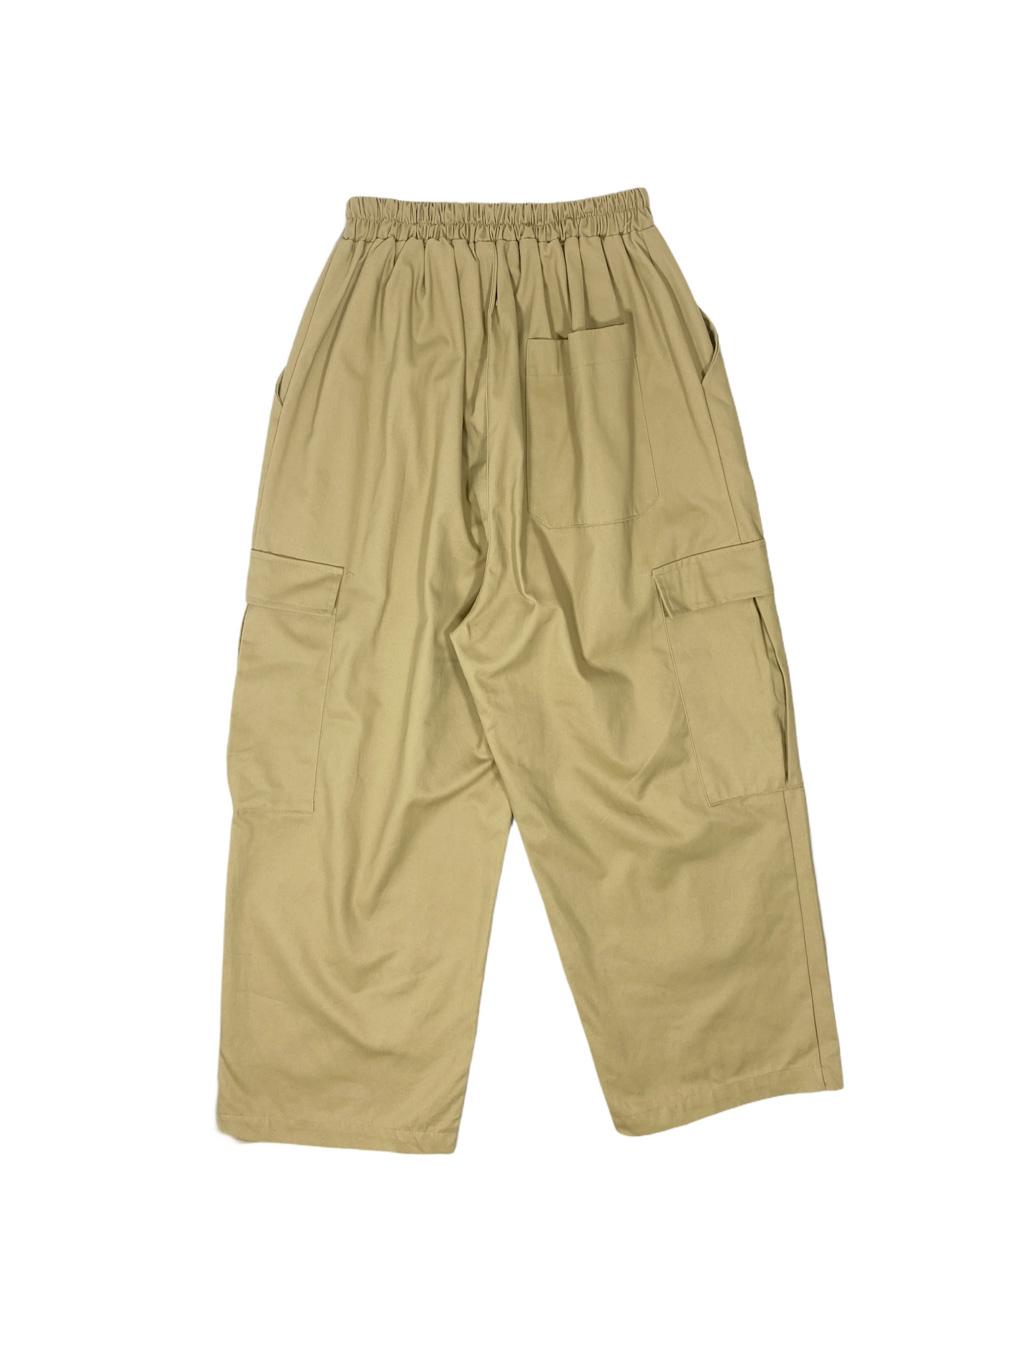 B & G Cargo Pants (Beige)